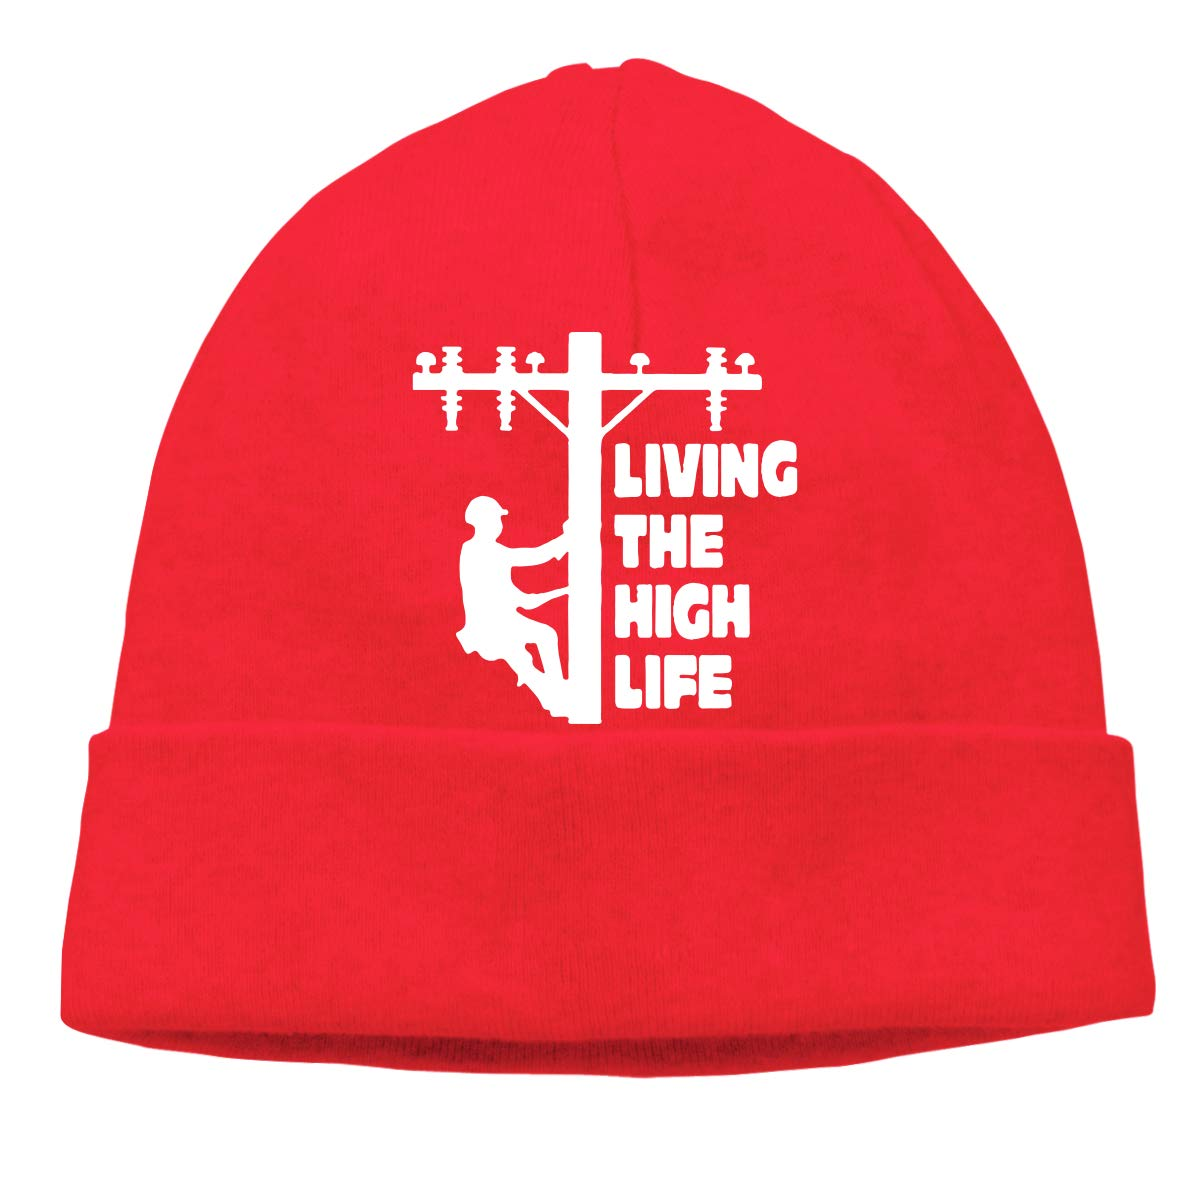 Cotton Skull Cap Lineman Knitted Cap Unisex Living The High Life